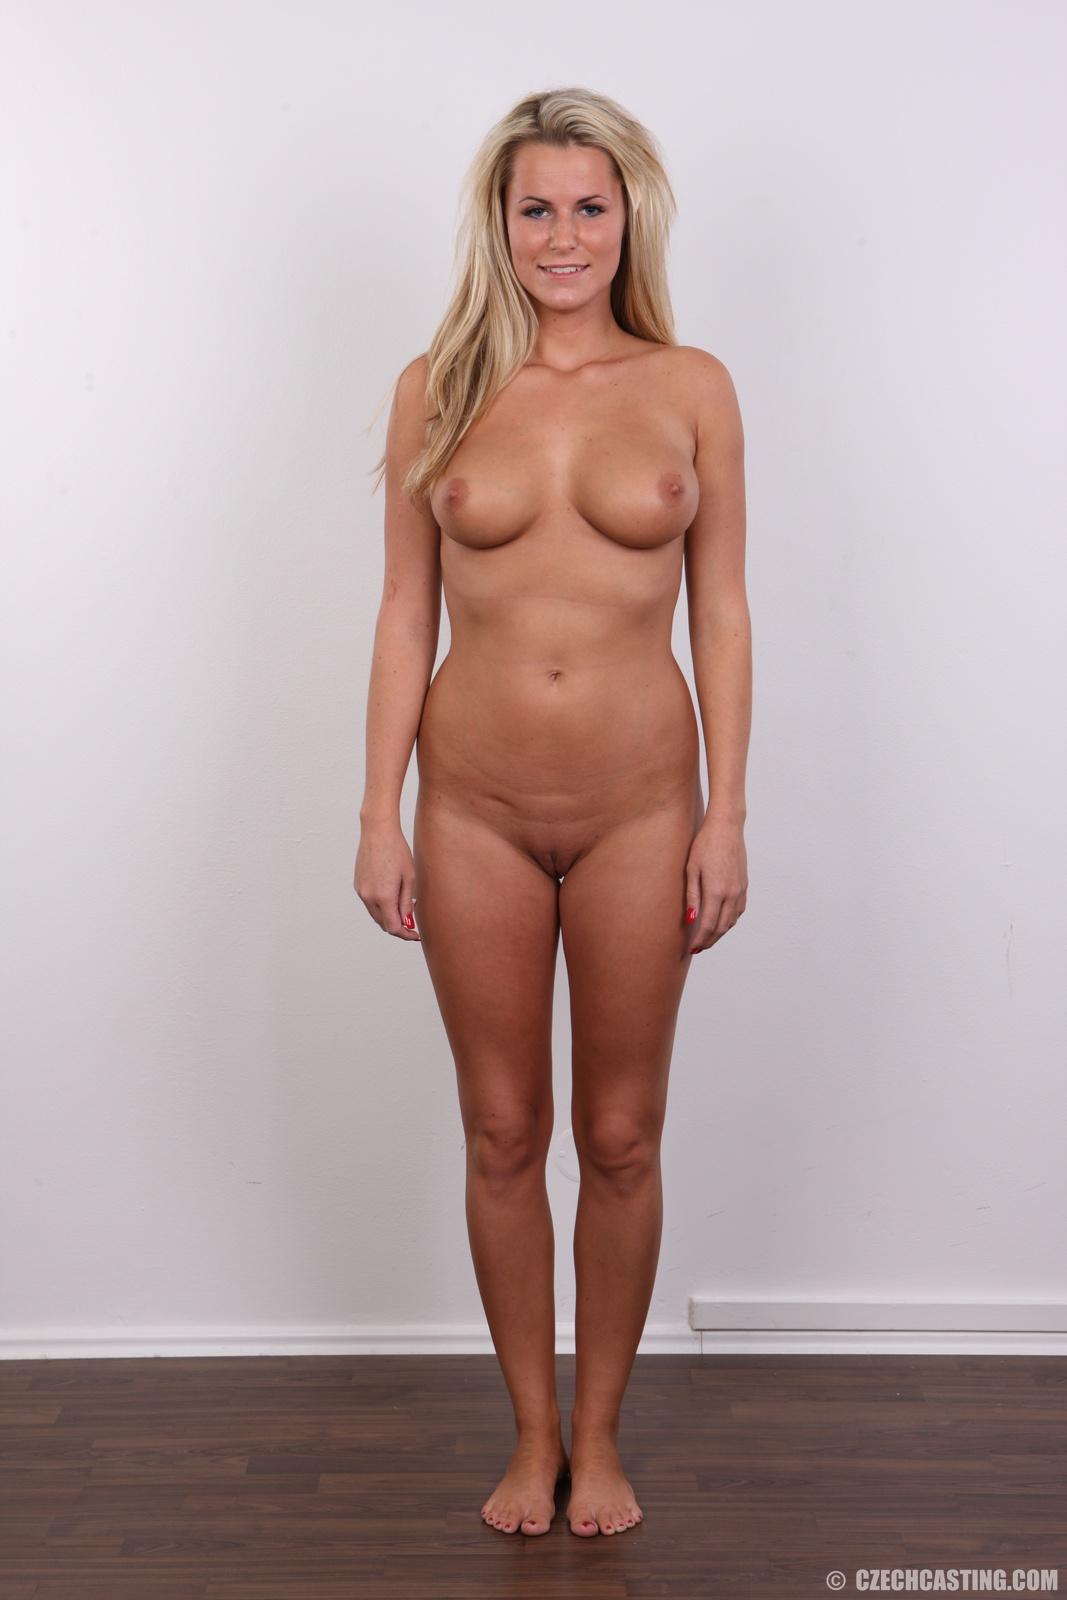 nicki minaj pussy nude all picturer